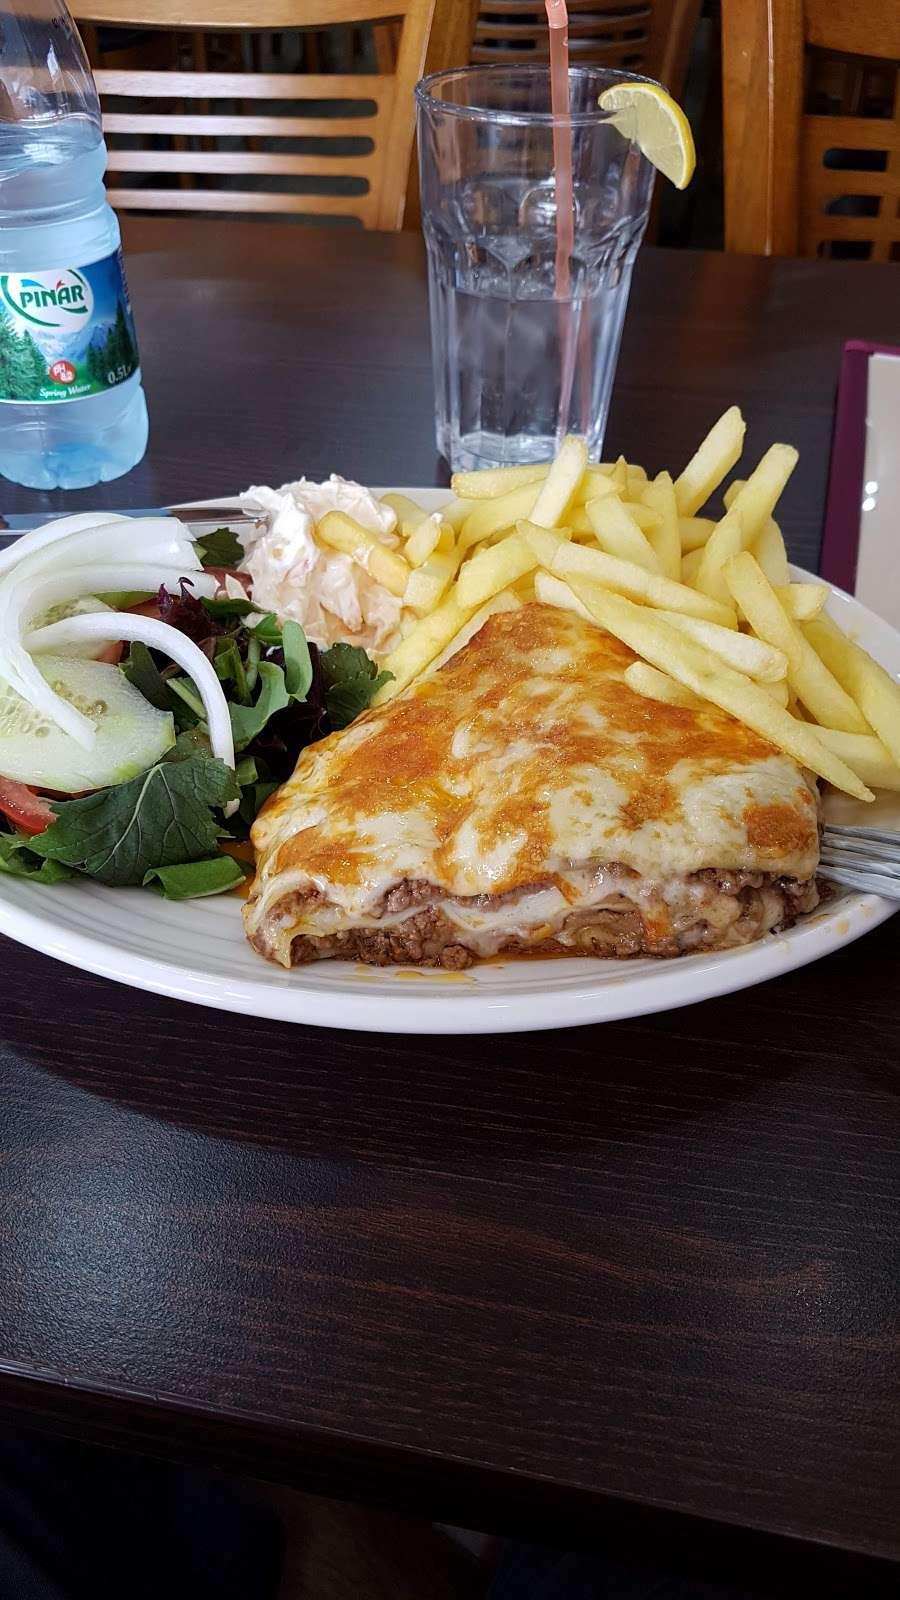 Riennas Restaurant - restaurant  | Photo 4 of 10 | Address: 210-176, A124, Hornchurch RM12 6QP, UK | Phone: 01708 469463